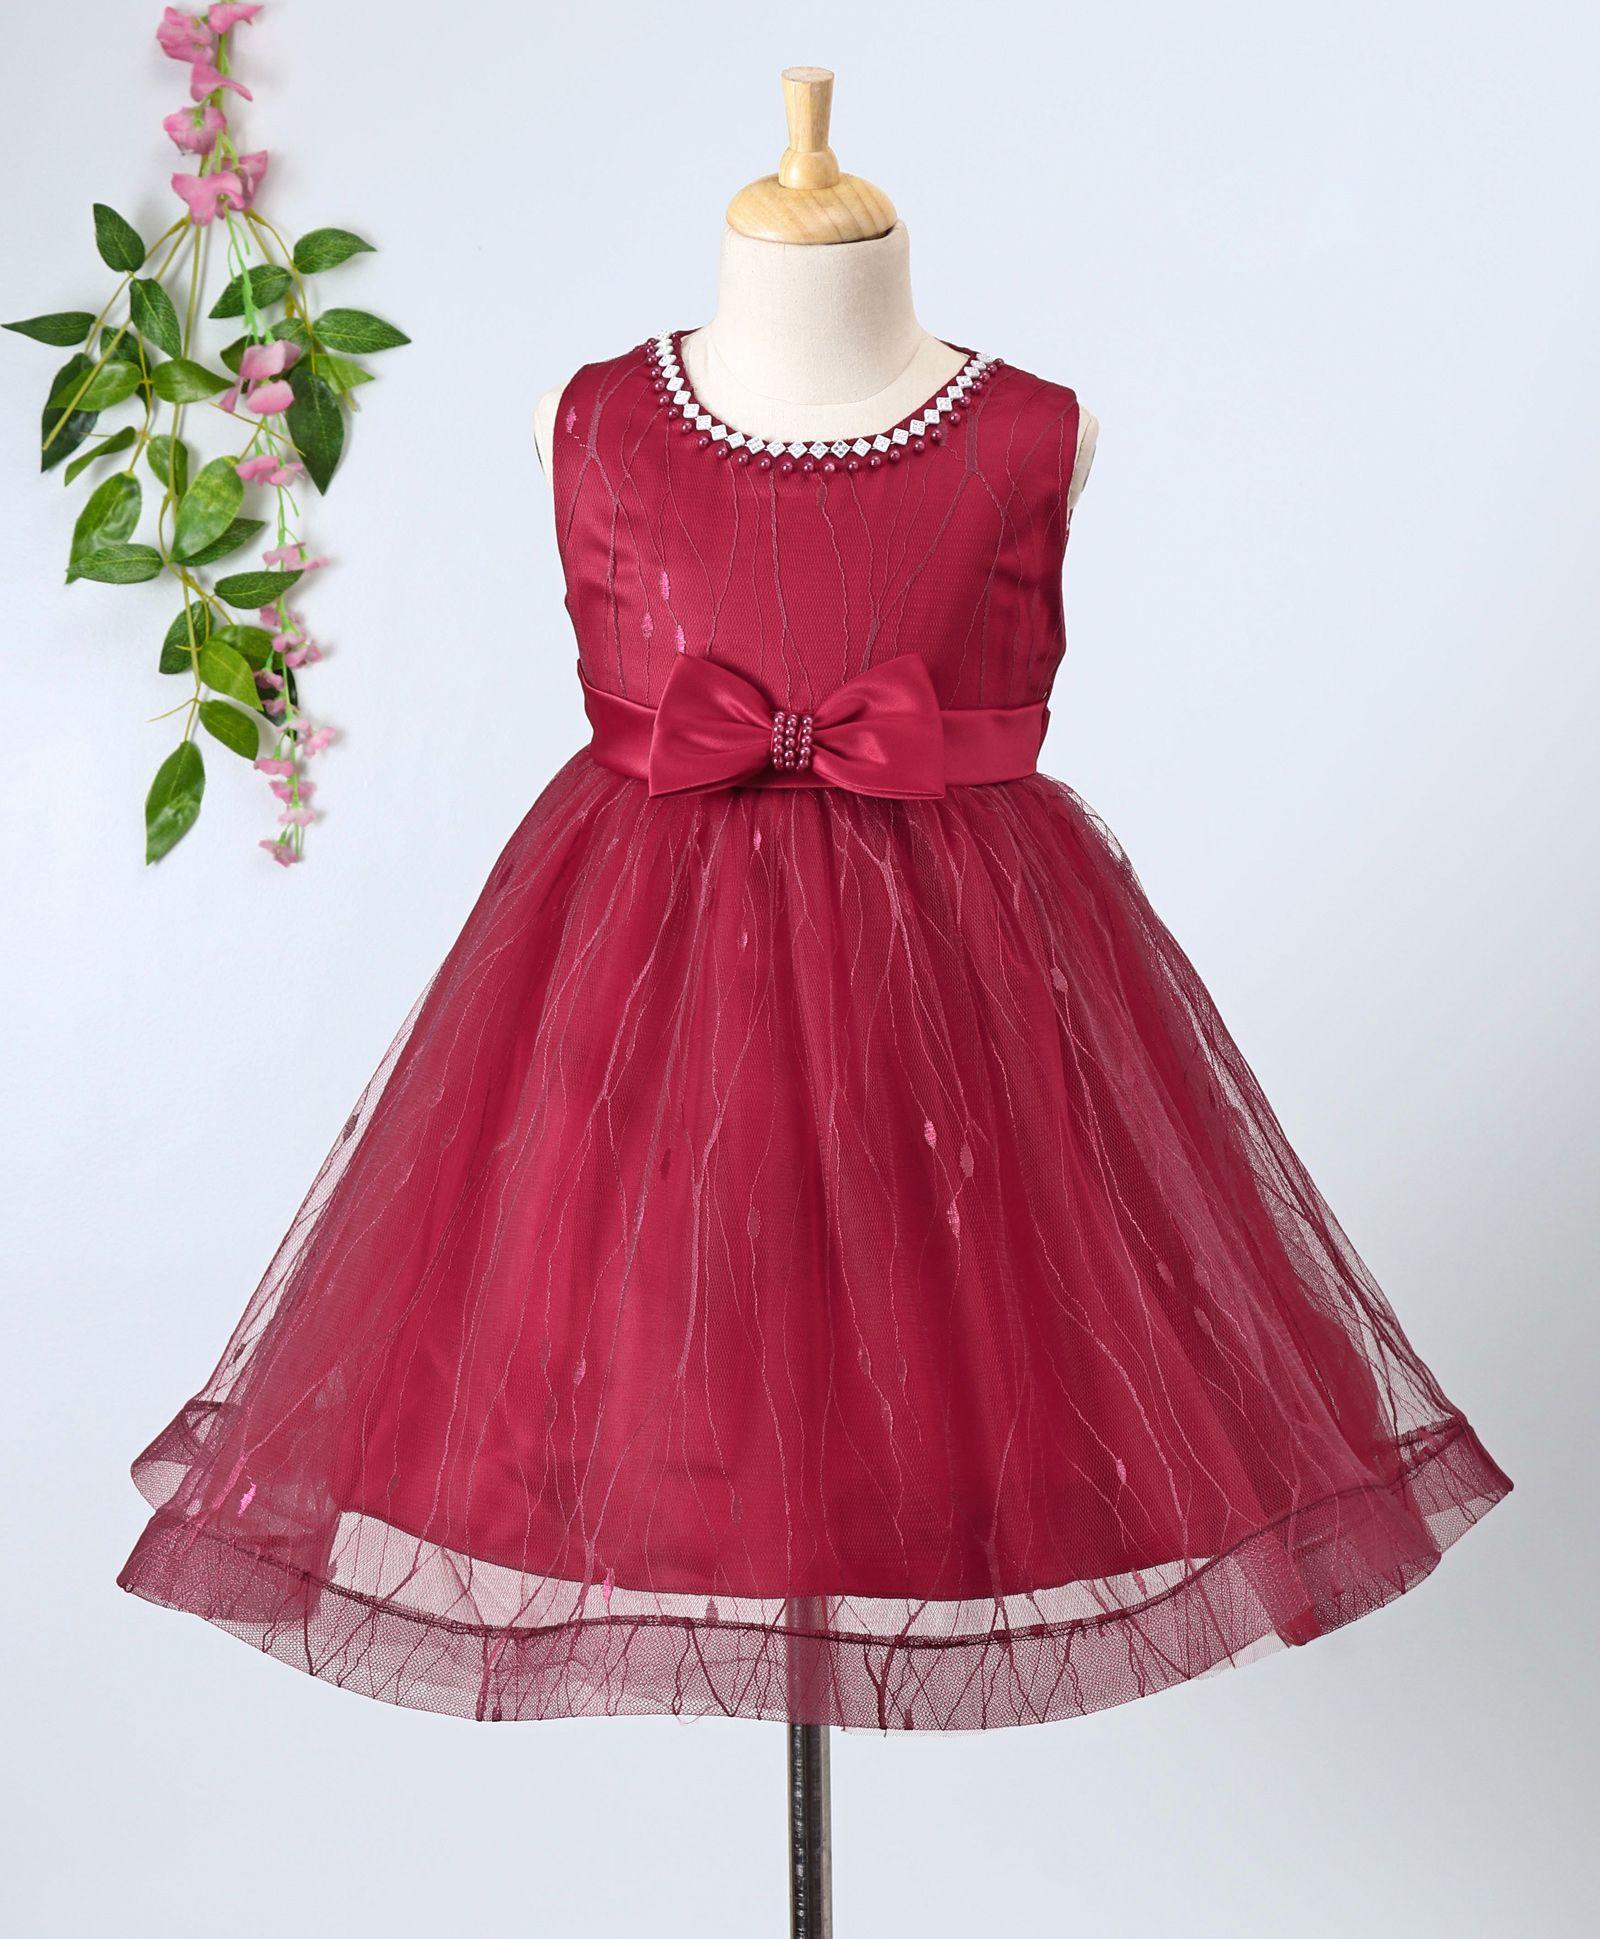 5bb2367b8fd3d Buy Aodaya Bow Applique Sleeveless Net Dress Maroon for Girls (3-6 Months)  Online in India, Shop at FirstCry.com - 2318698